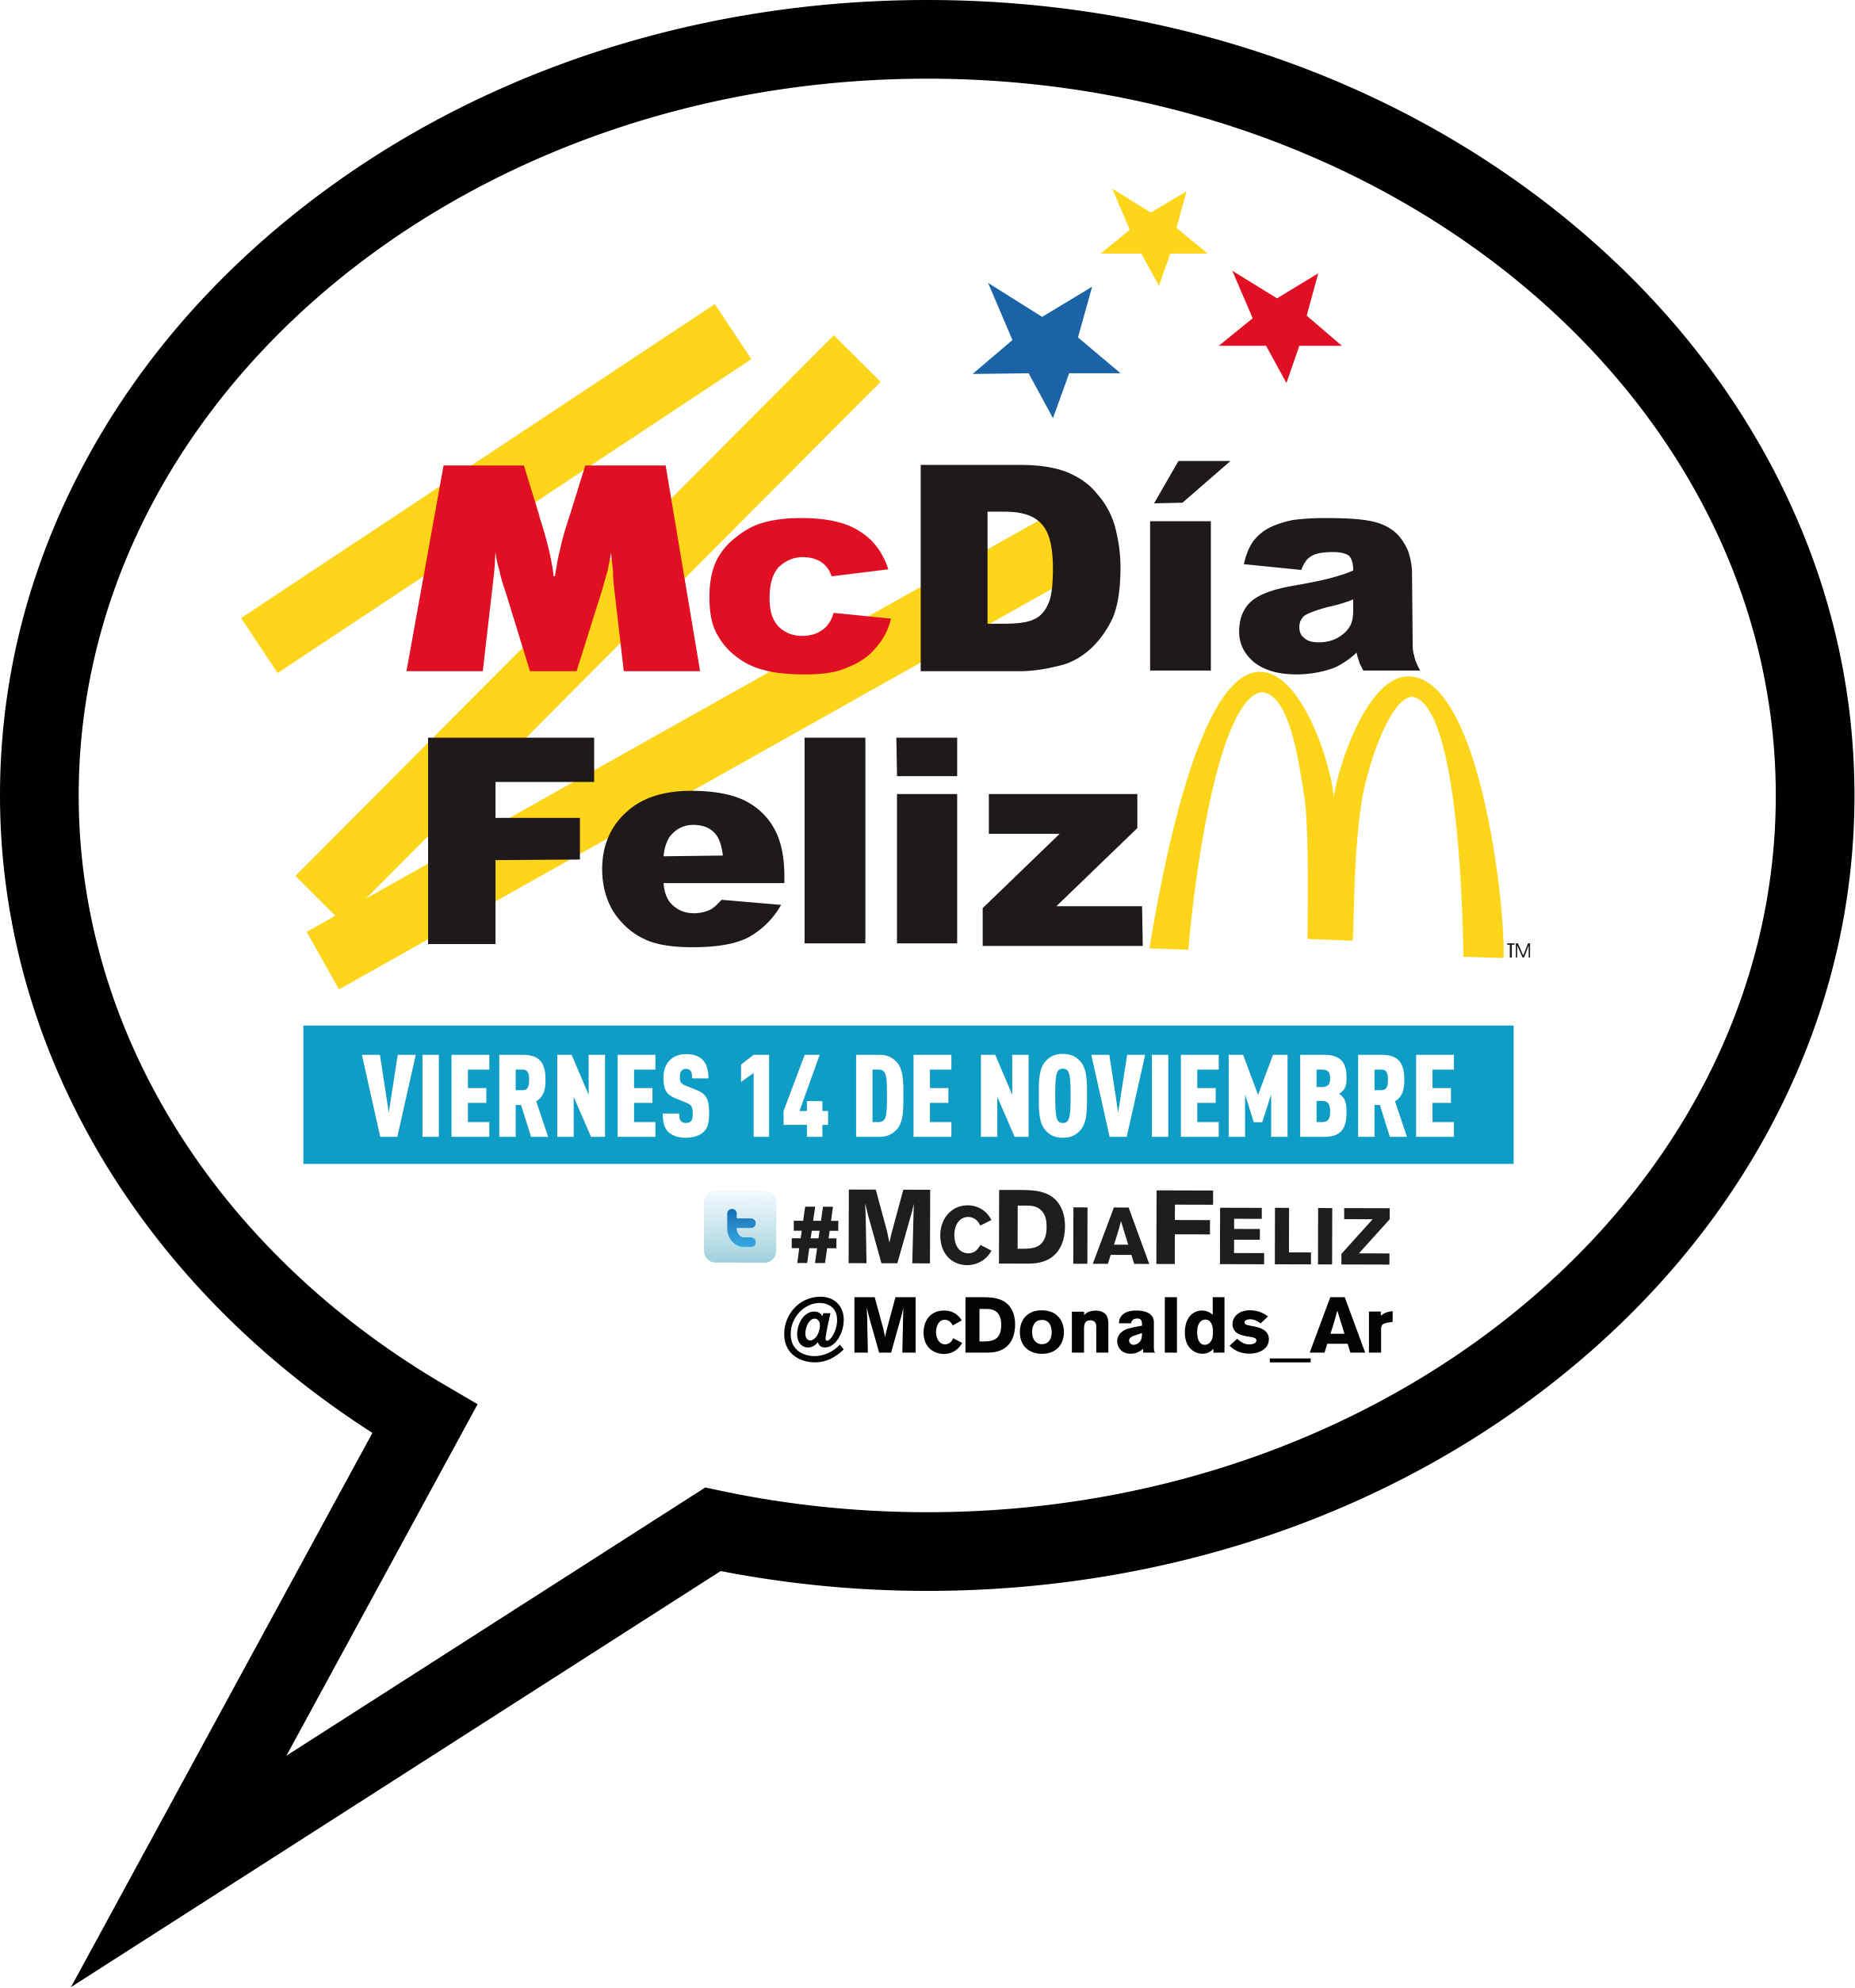 Mcdia Feliz 2016 Globos Mcdia